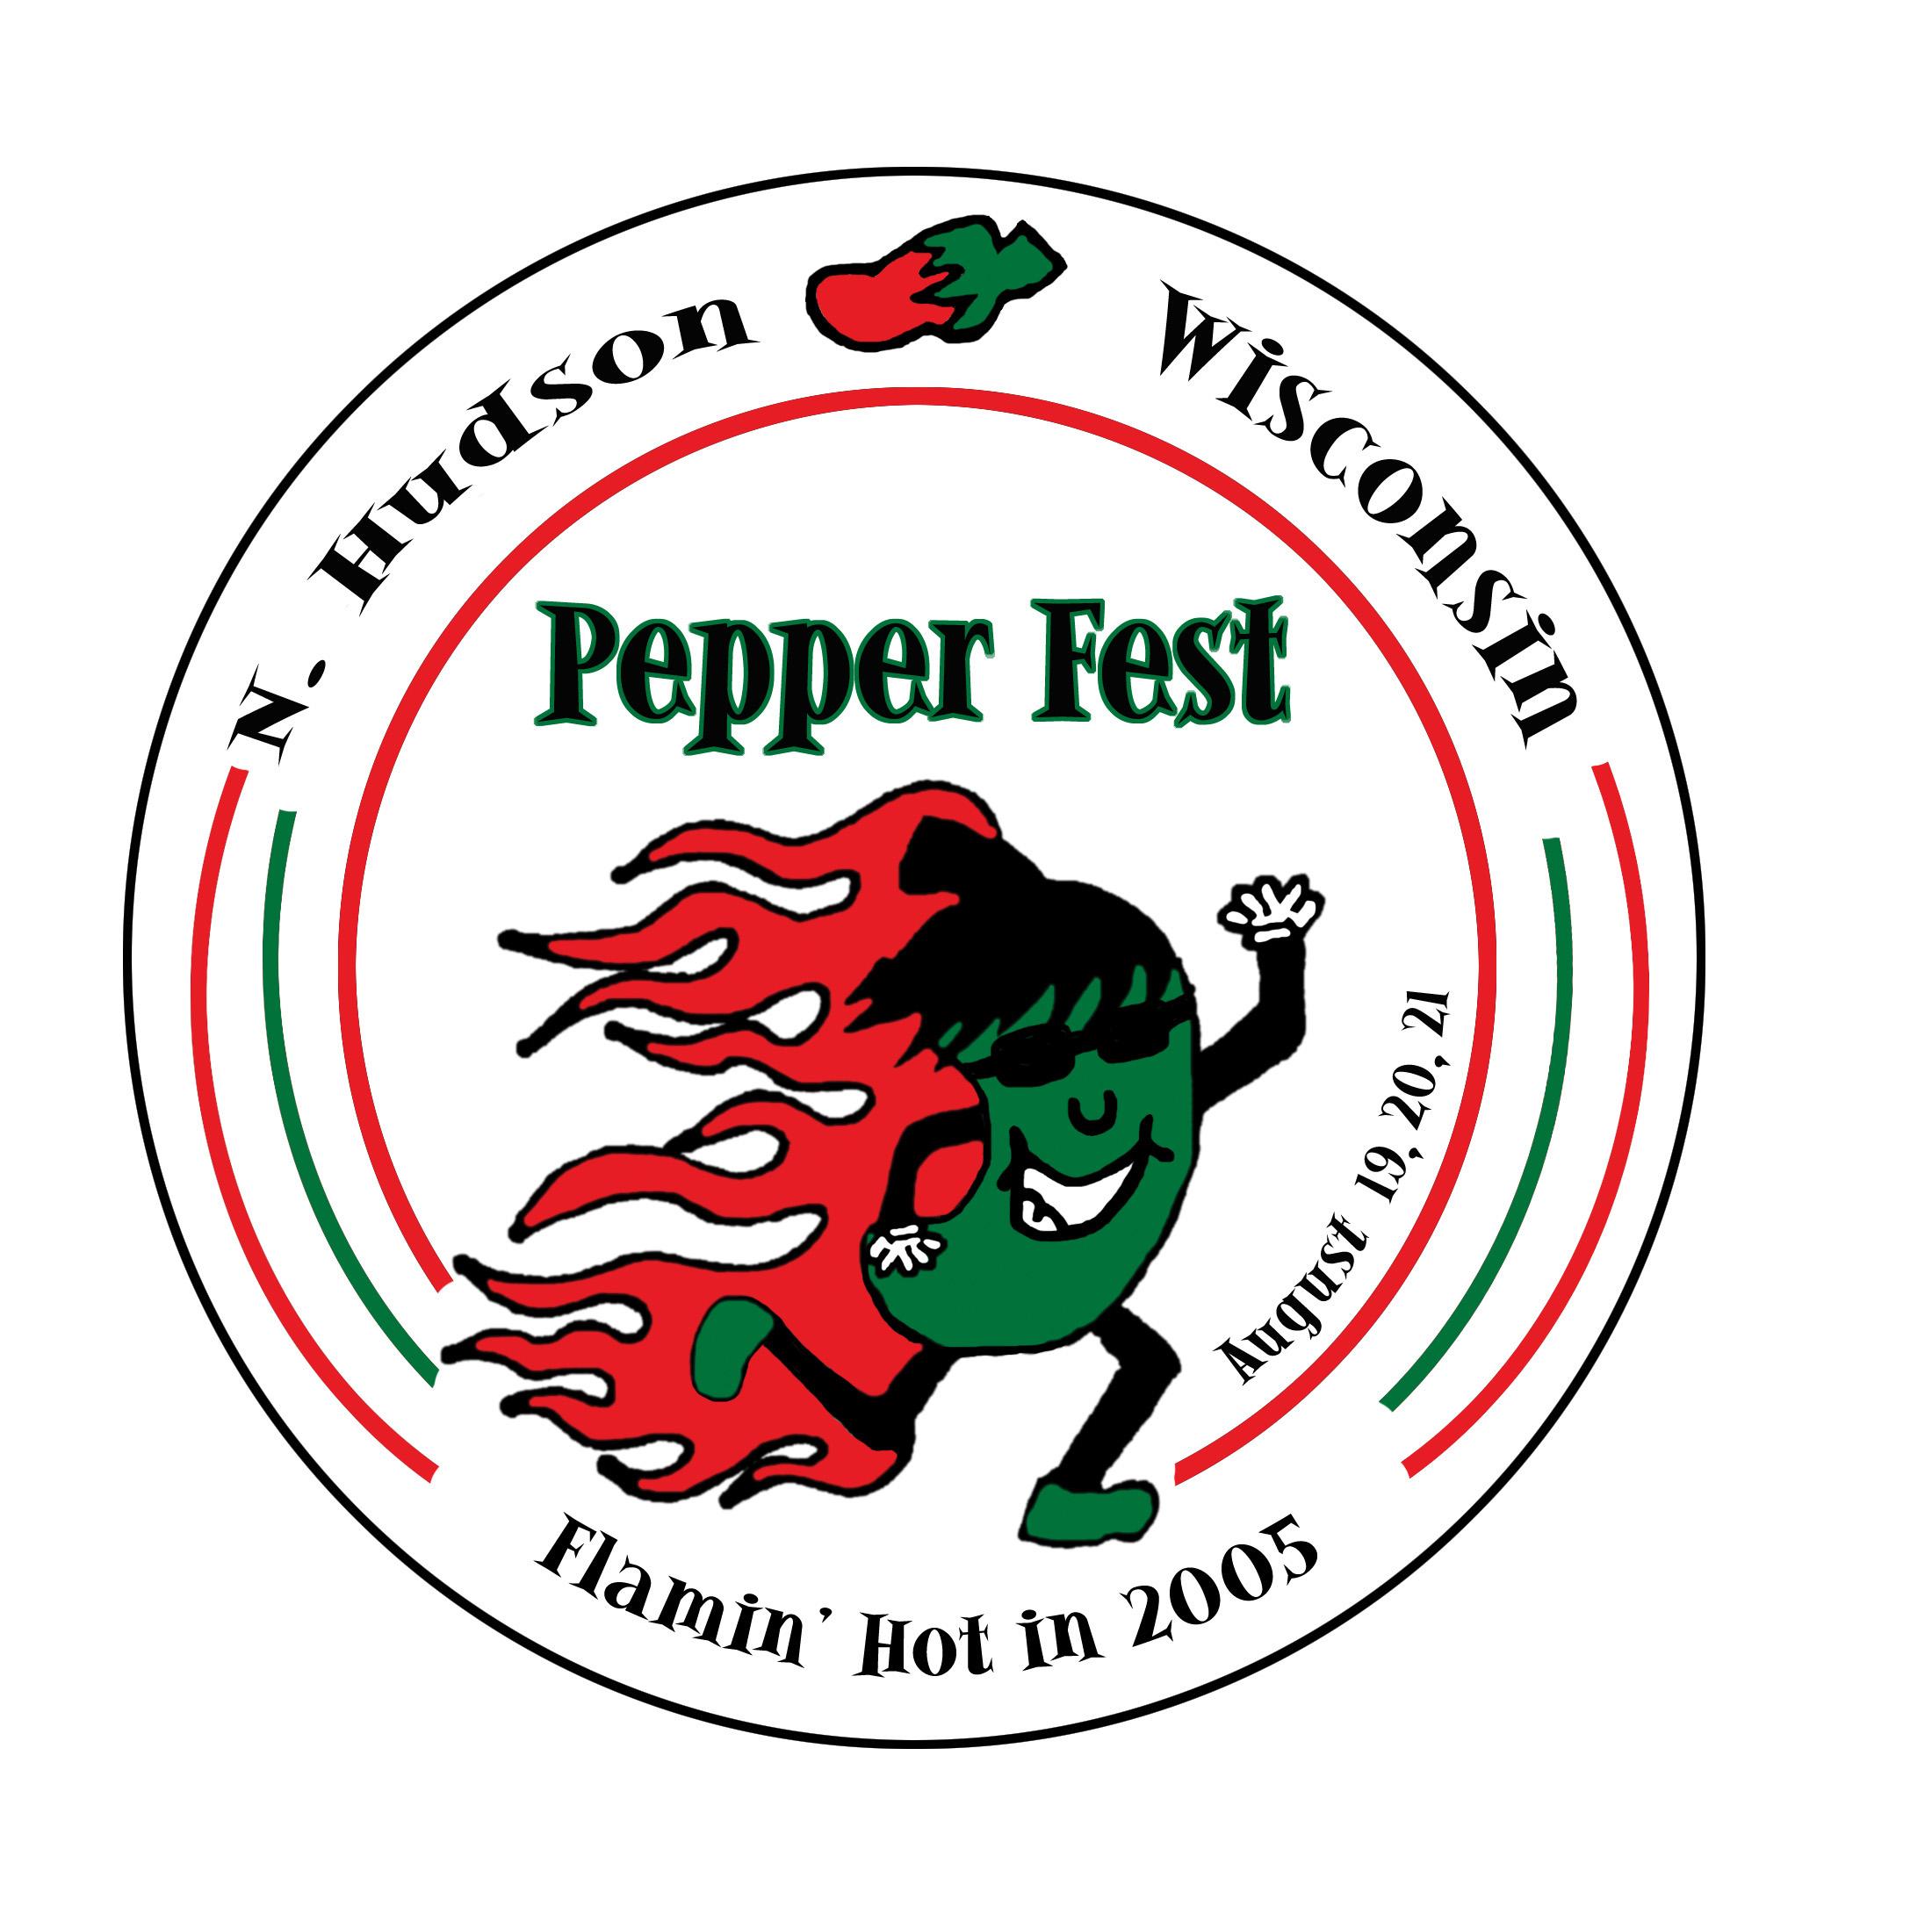 2005 PepperFest2005TShirtsPosters.jpg